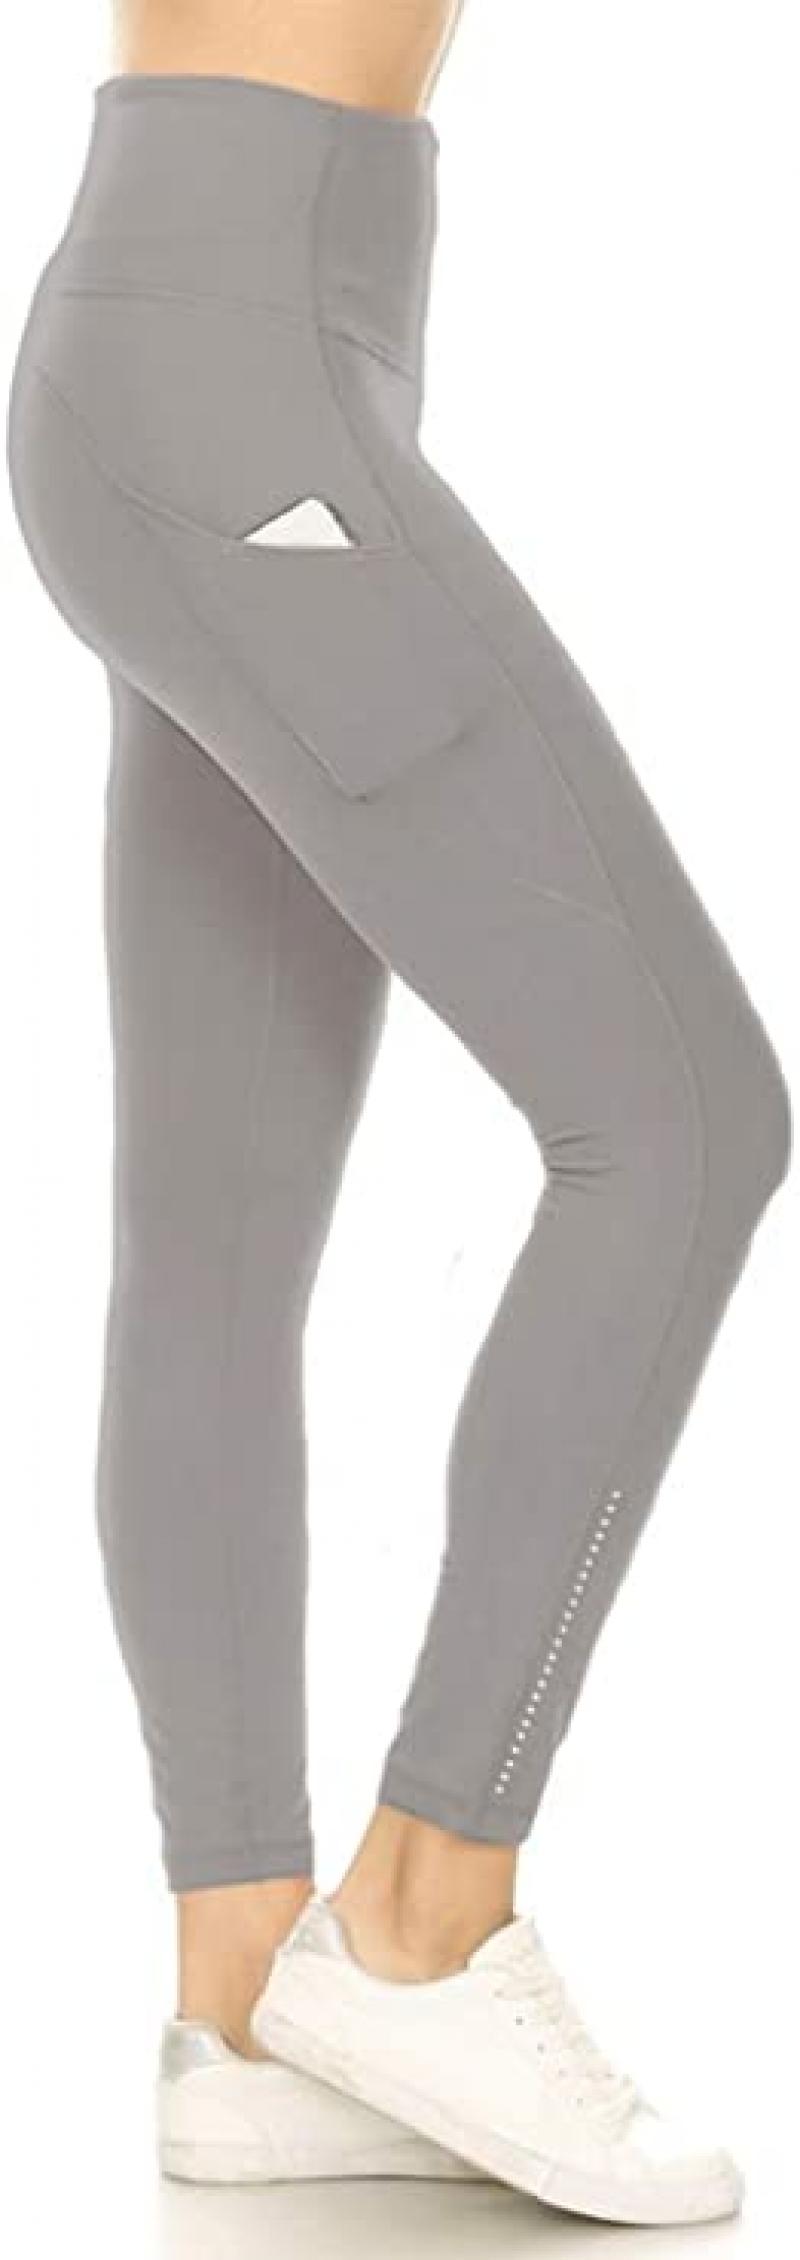 ihocon: Leggings Depot High Waisted 7/8 Leggings Athletic Yoga Pants with Side Pockets   女士高腰緊身褲